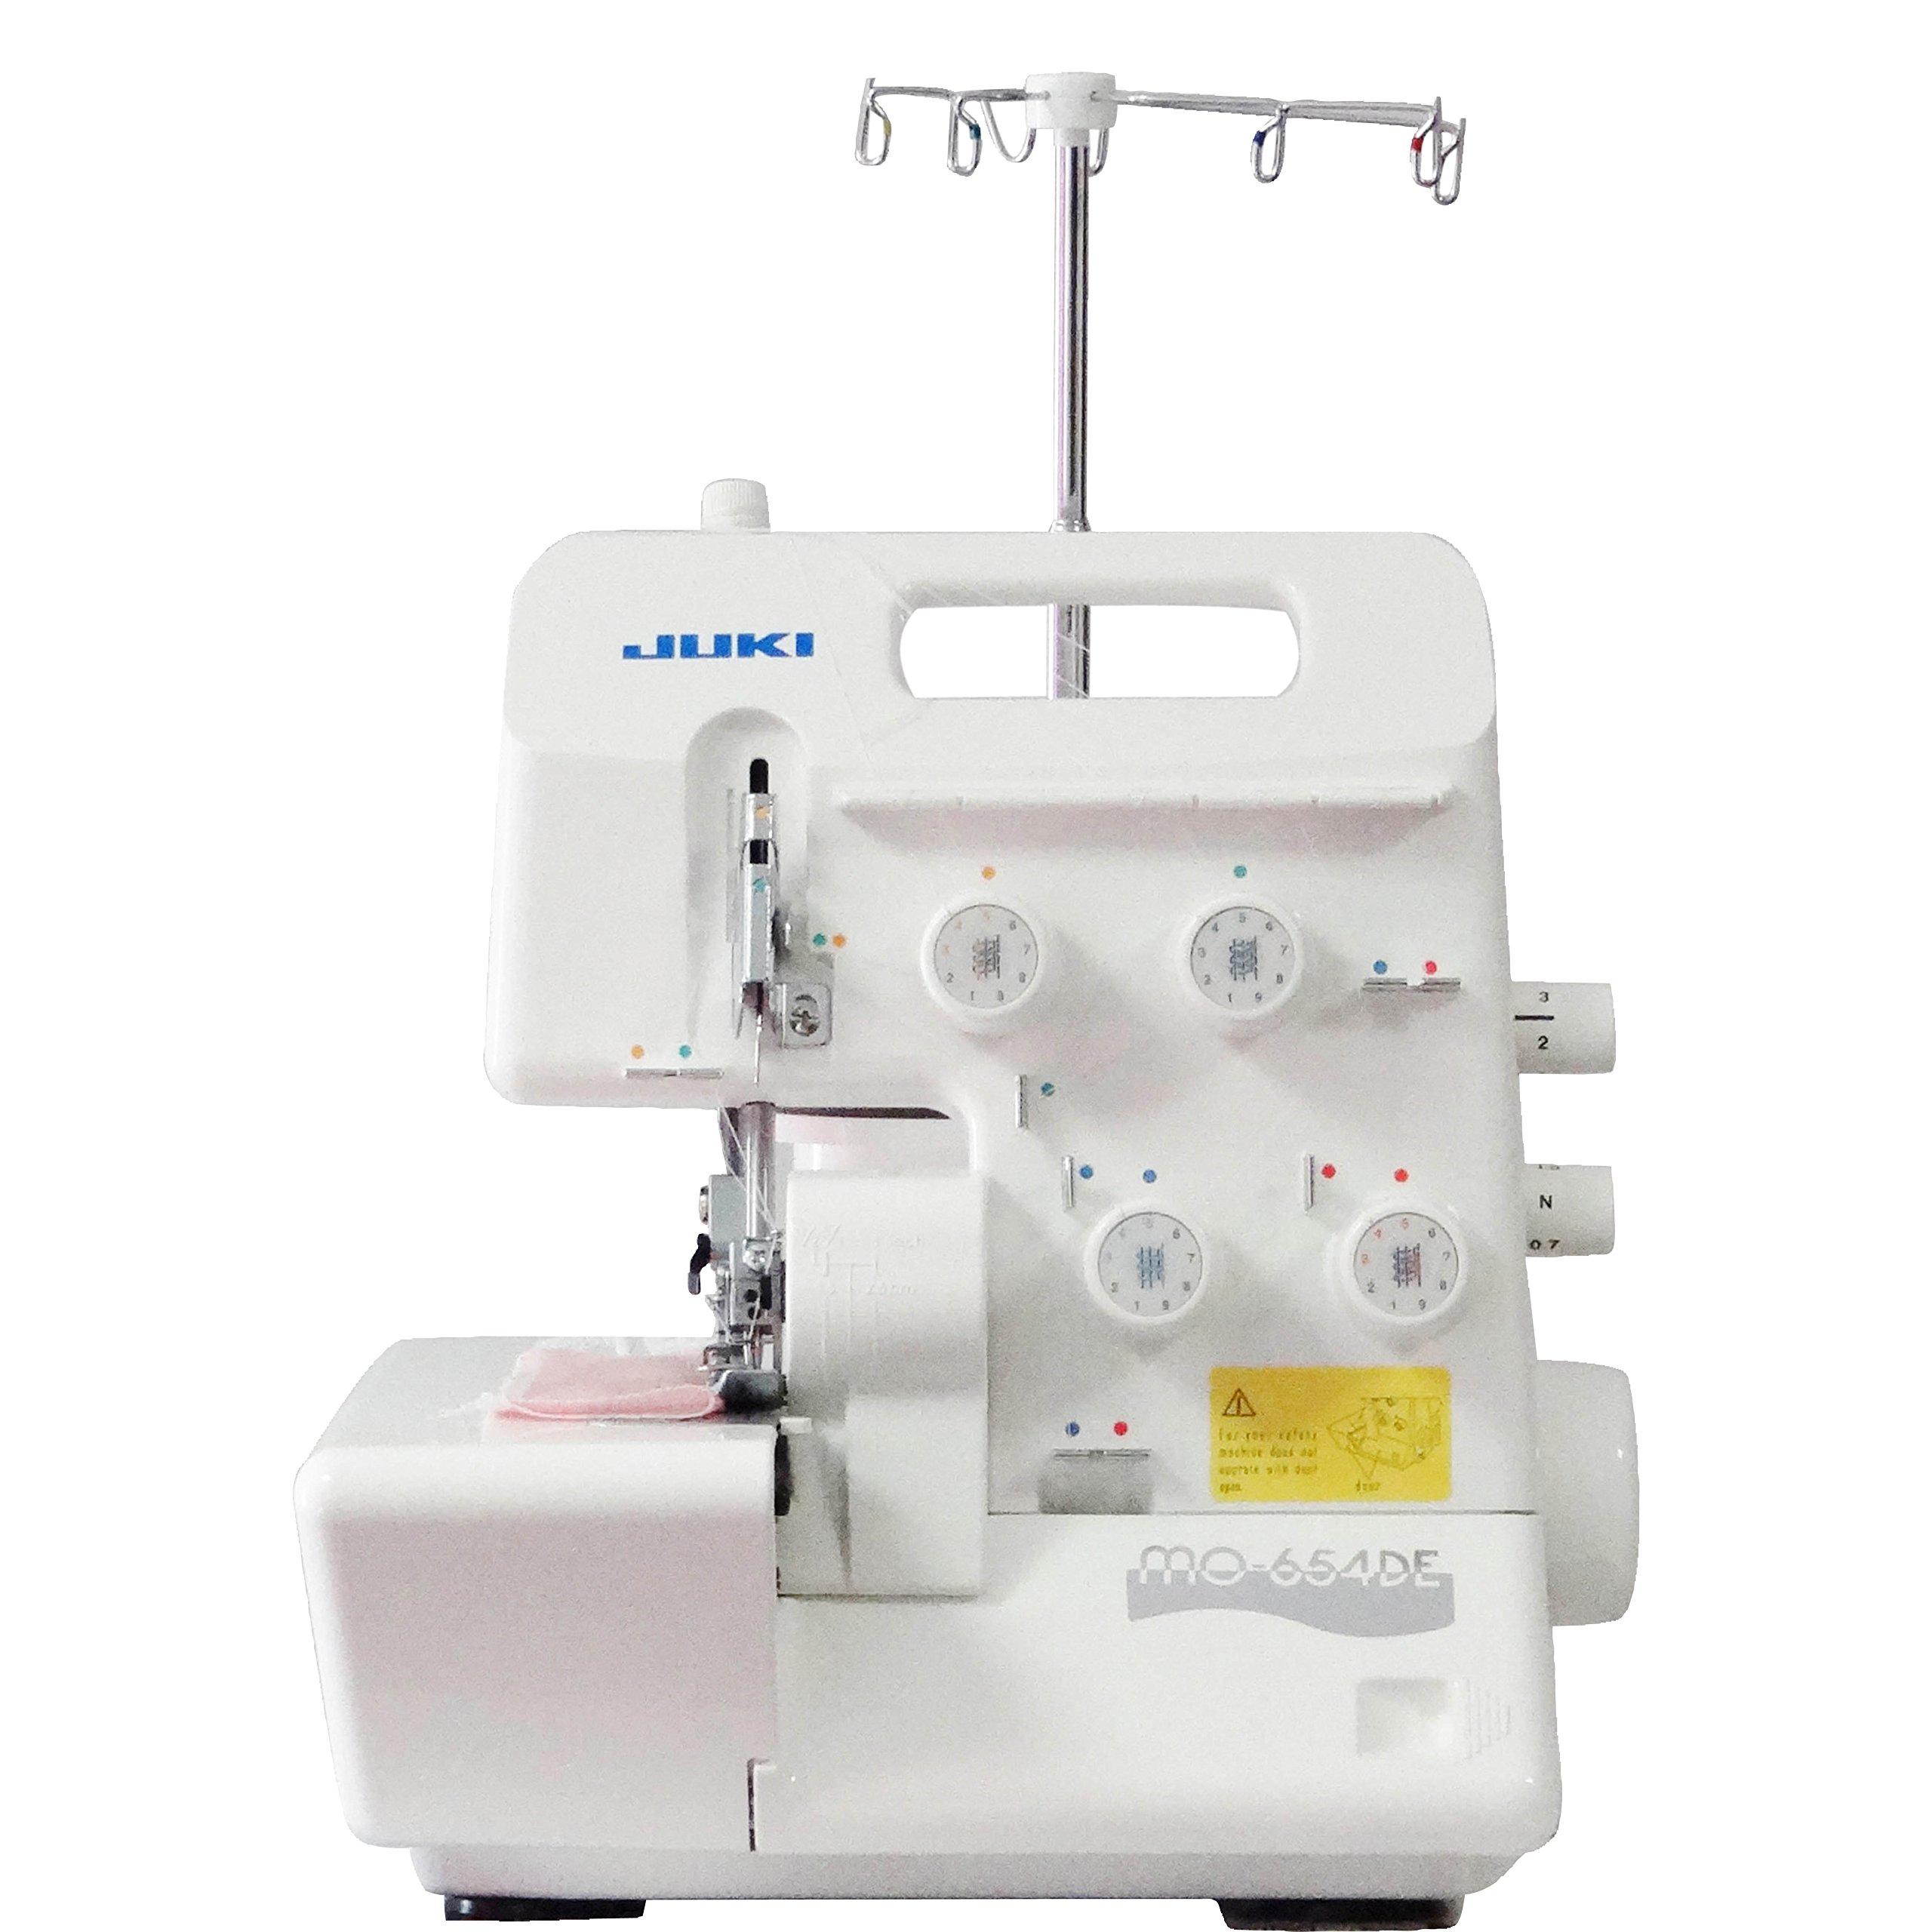 Juki MO-654DE Surjeteuse, Métal, Blanc, 34 x 27 x 29,5 cm product image